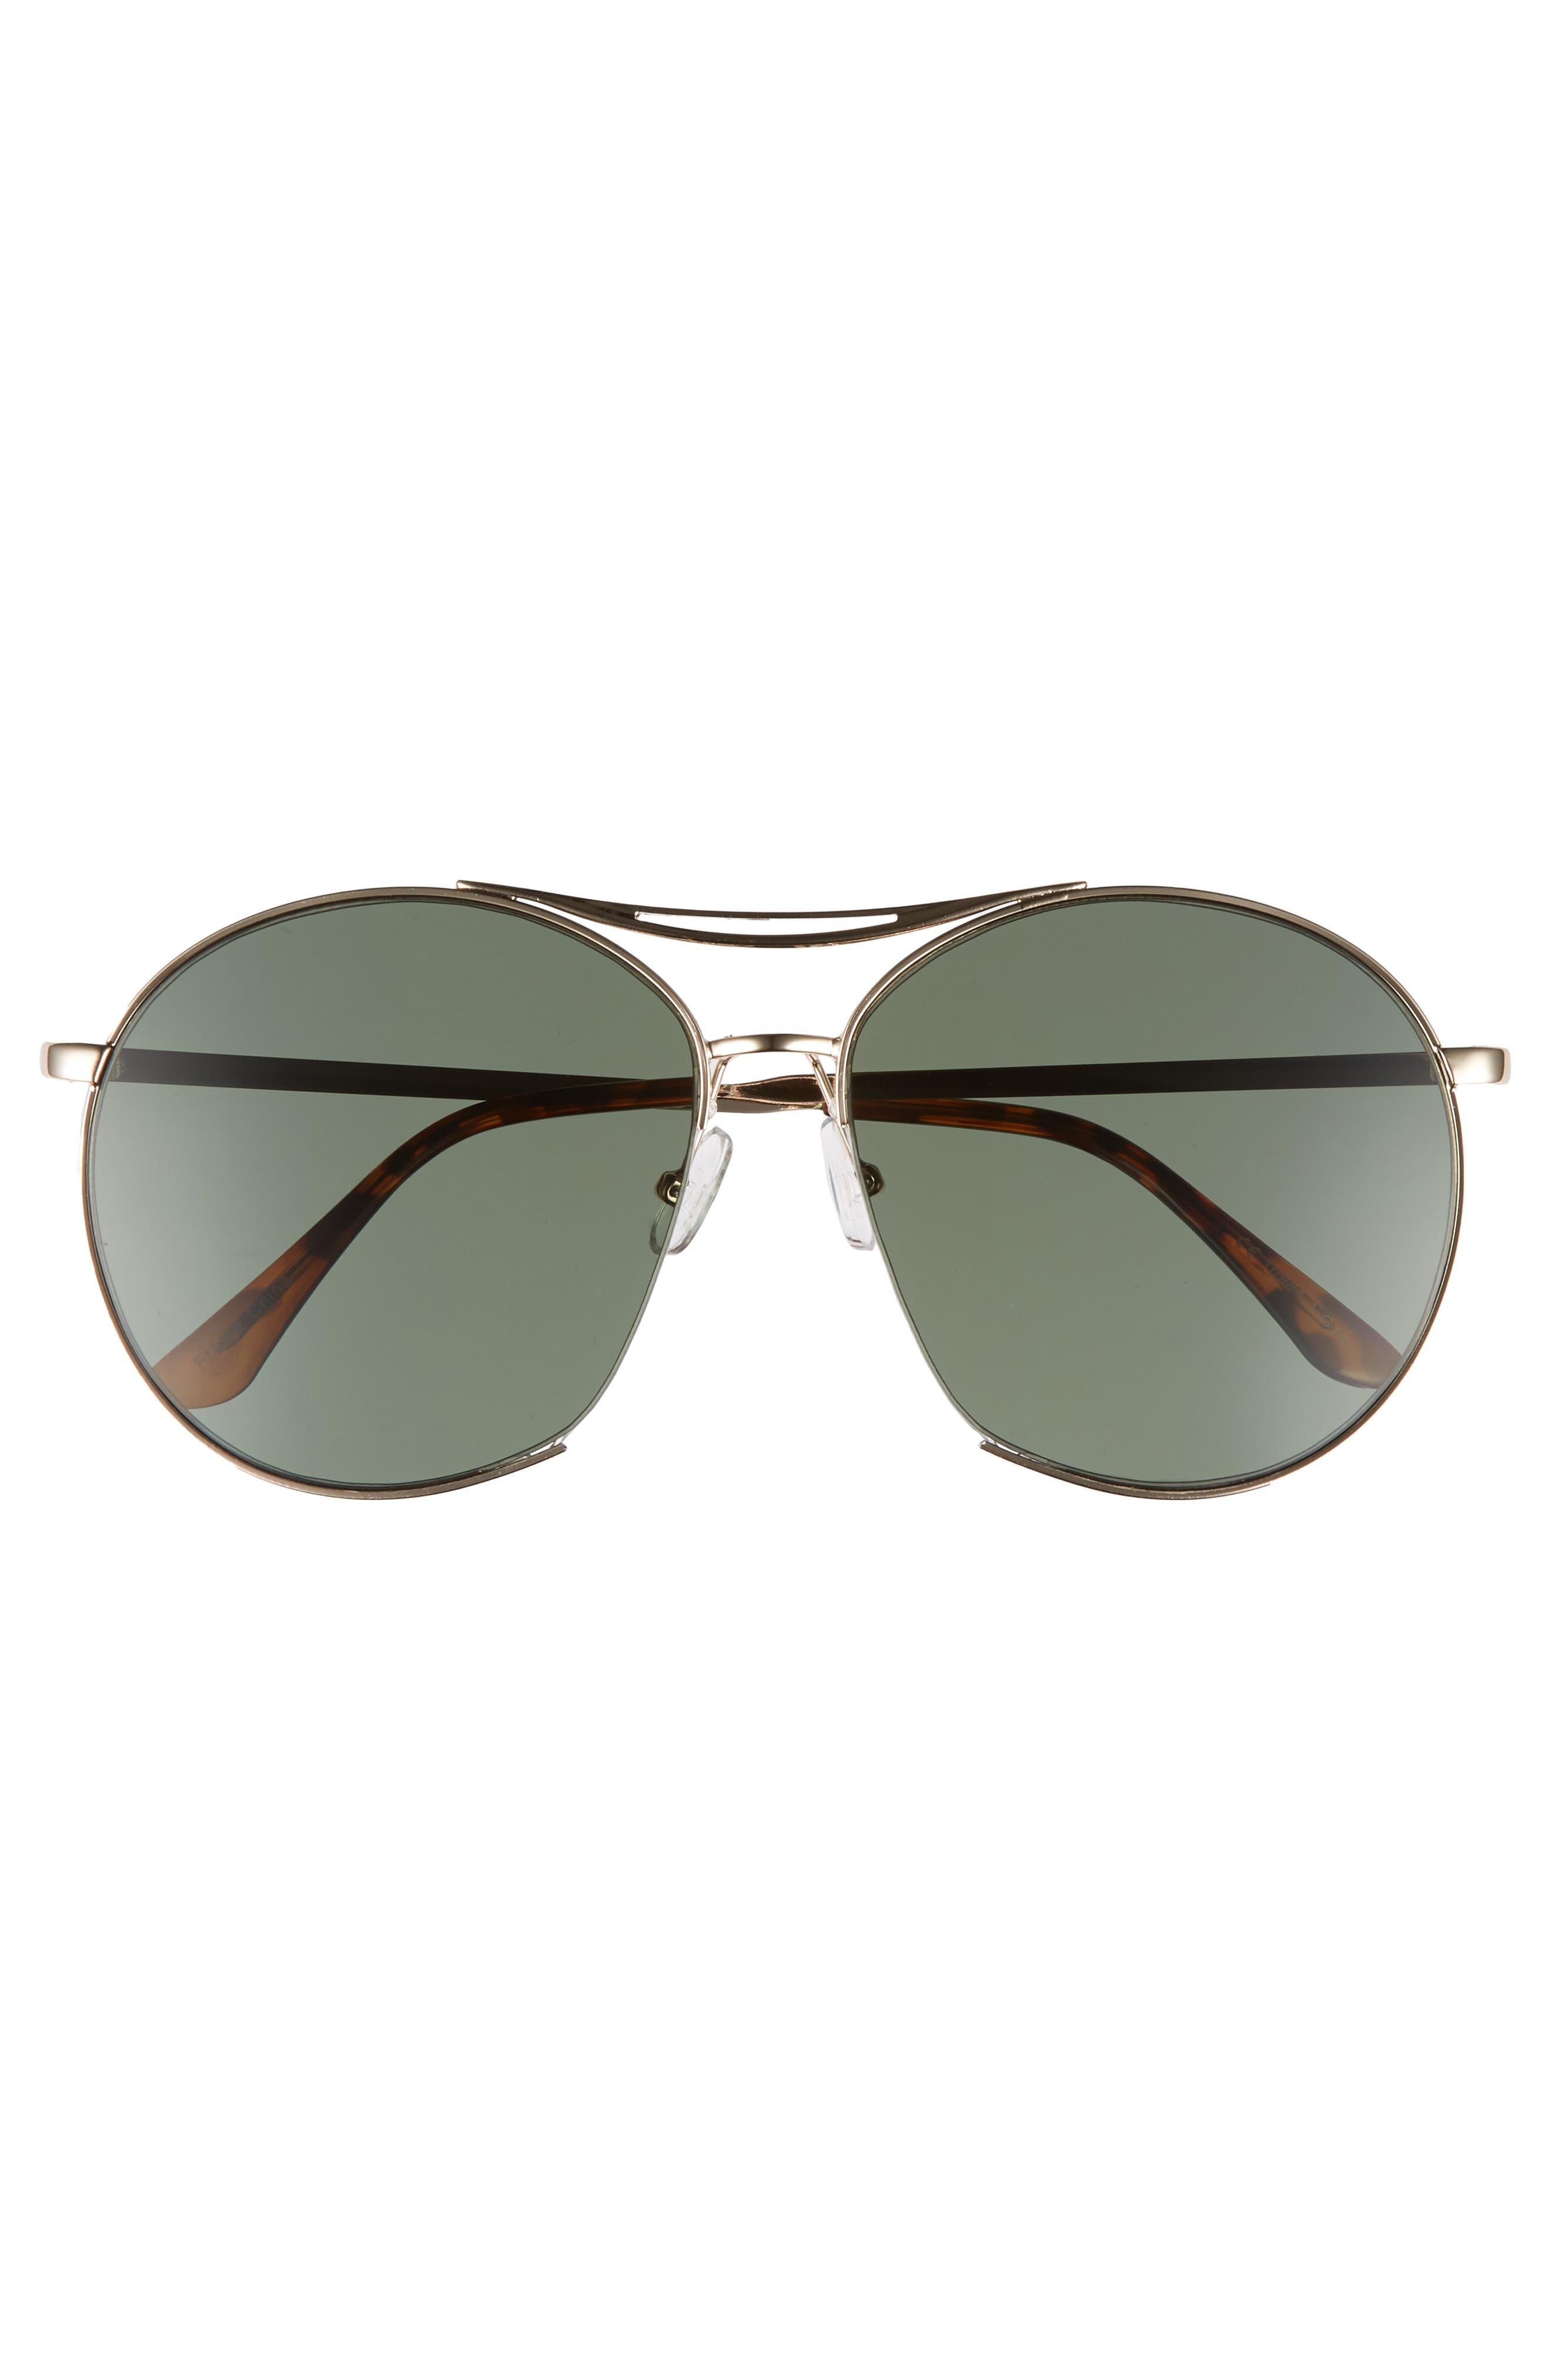 60mm Round Aviator Sunglasses,                             Alternate thumbnail 3, color,                             710